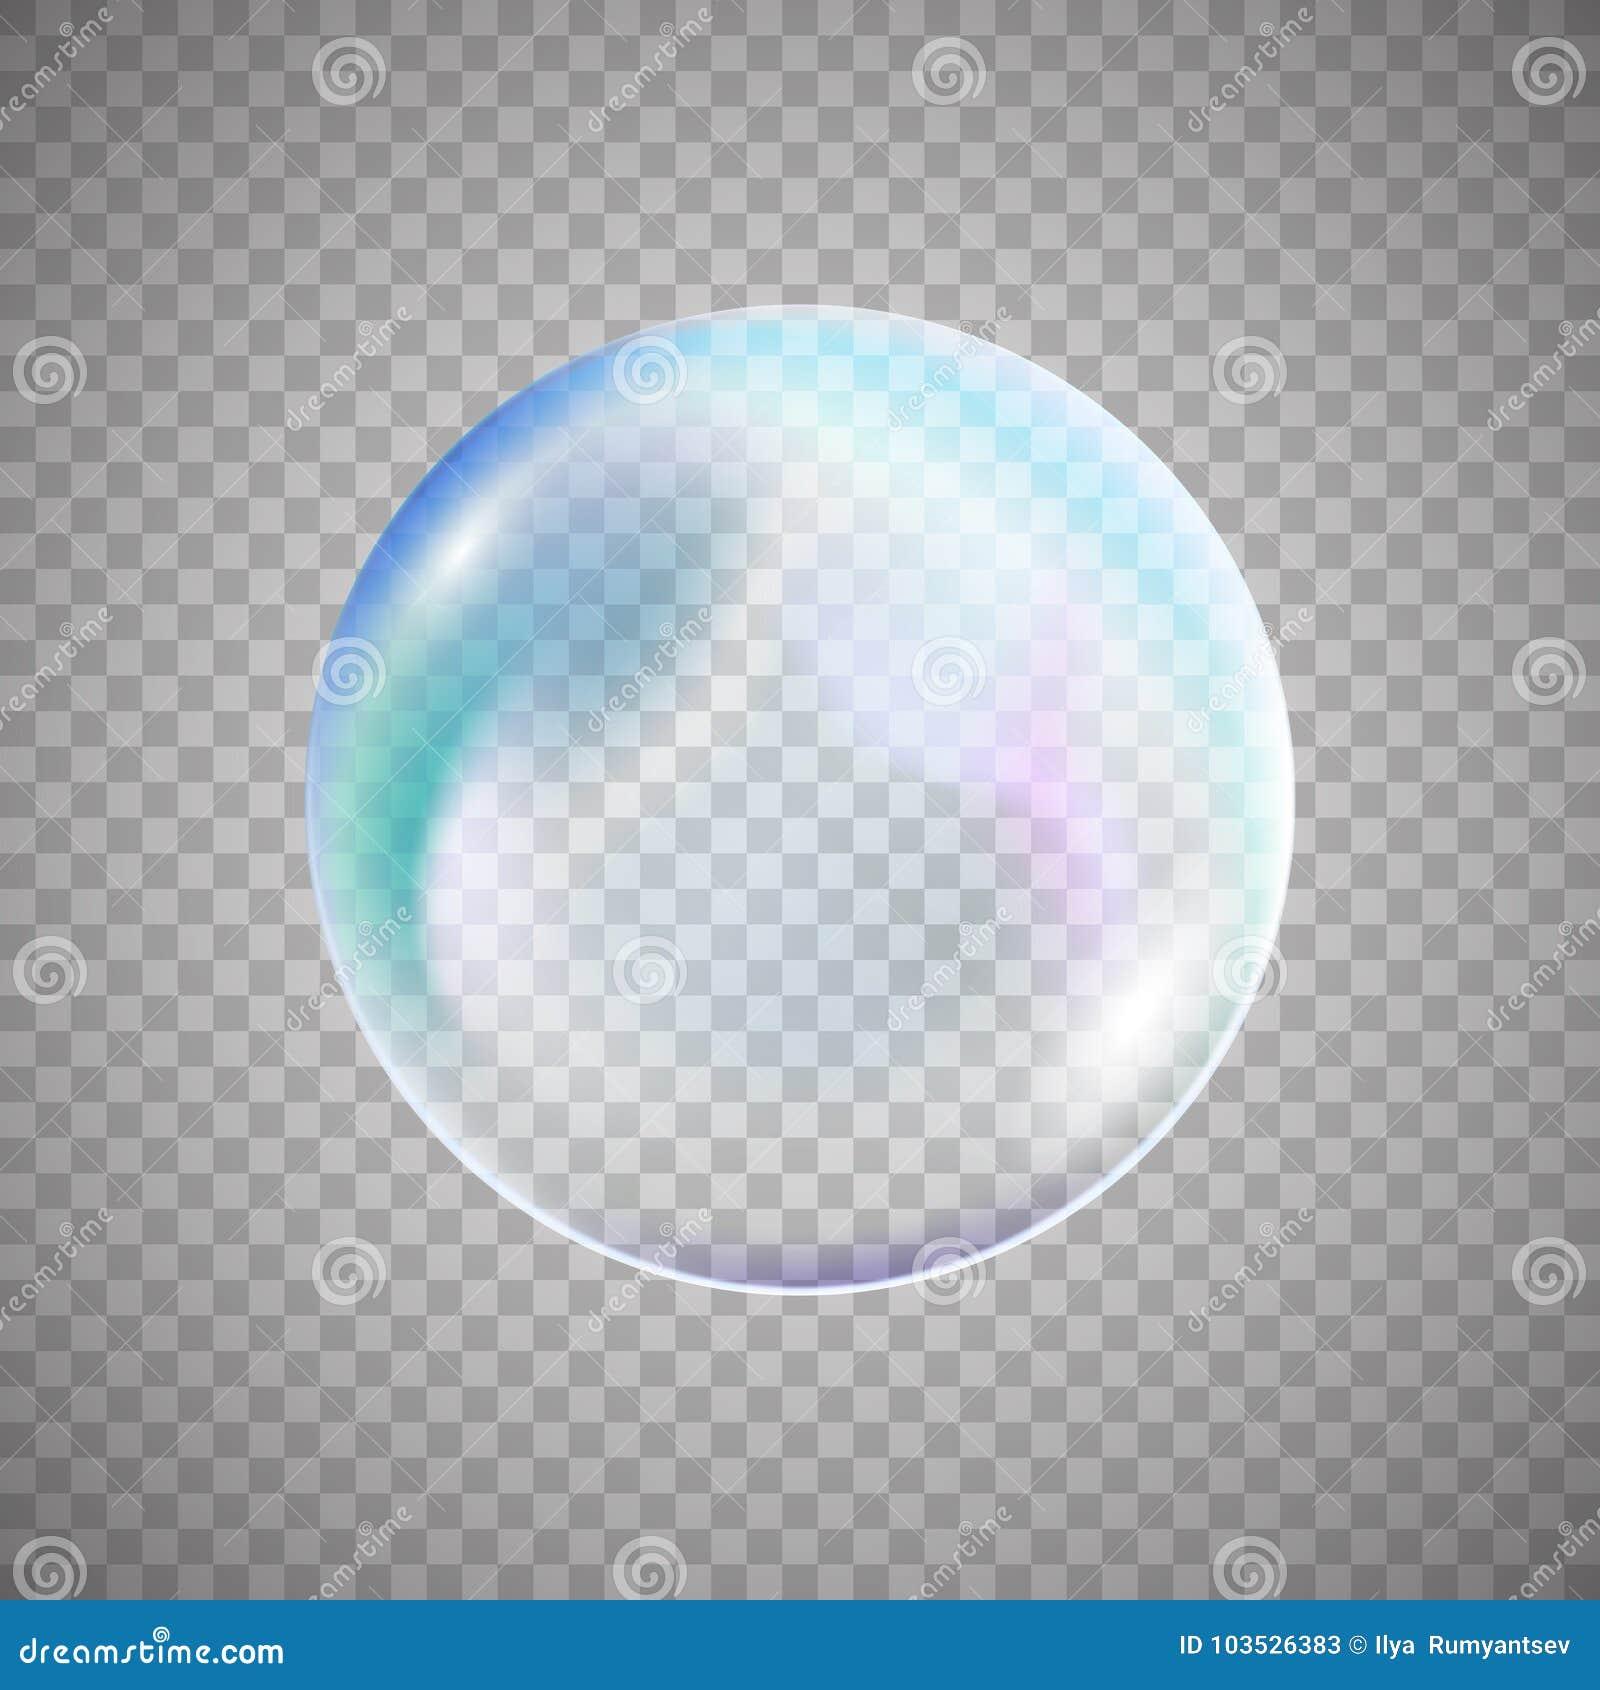 Transparent colorful soap bubble on simple background